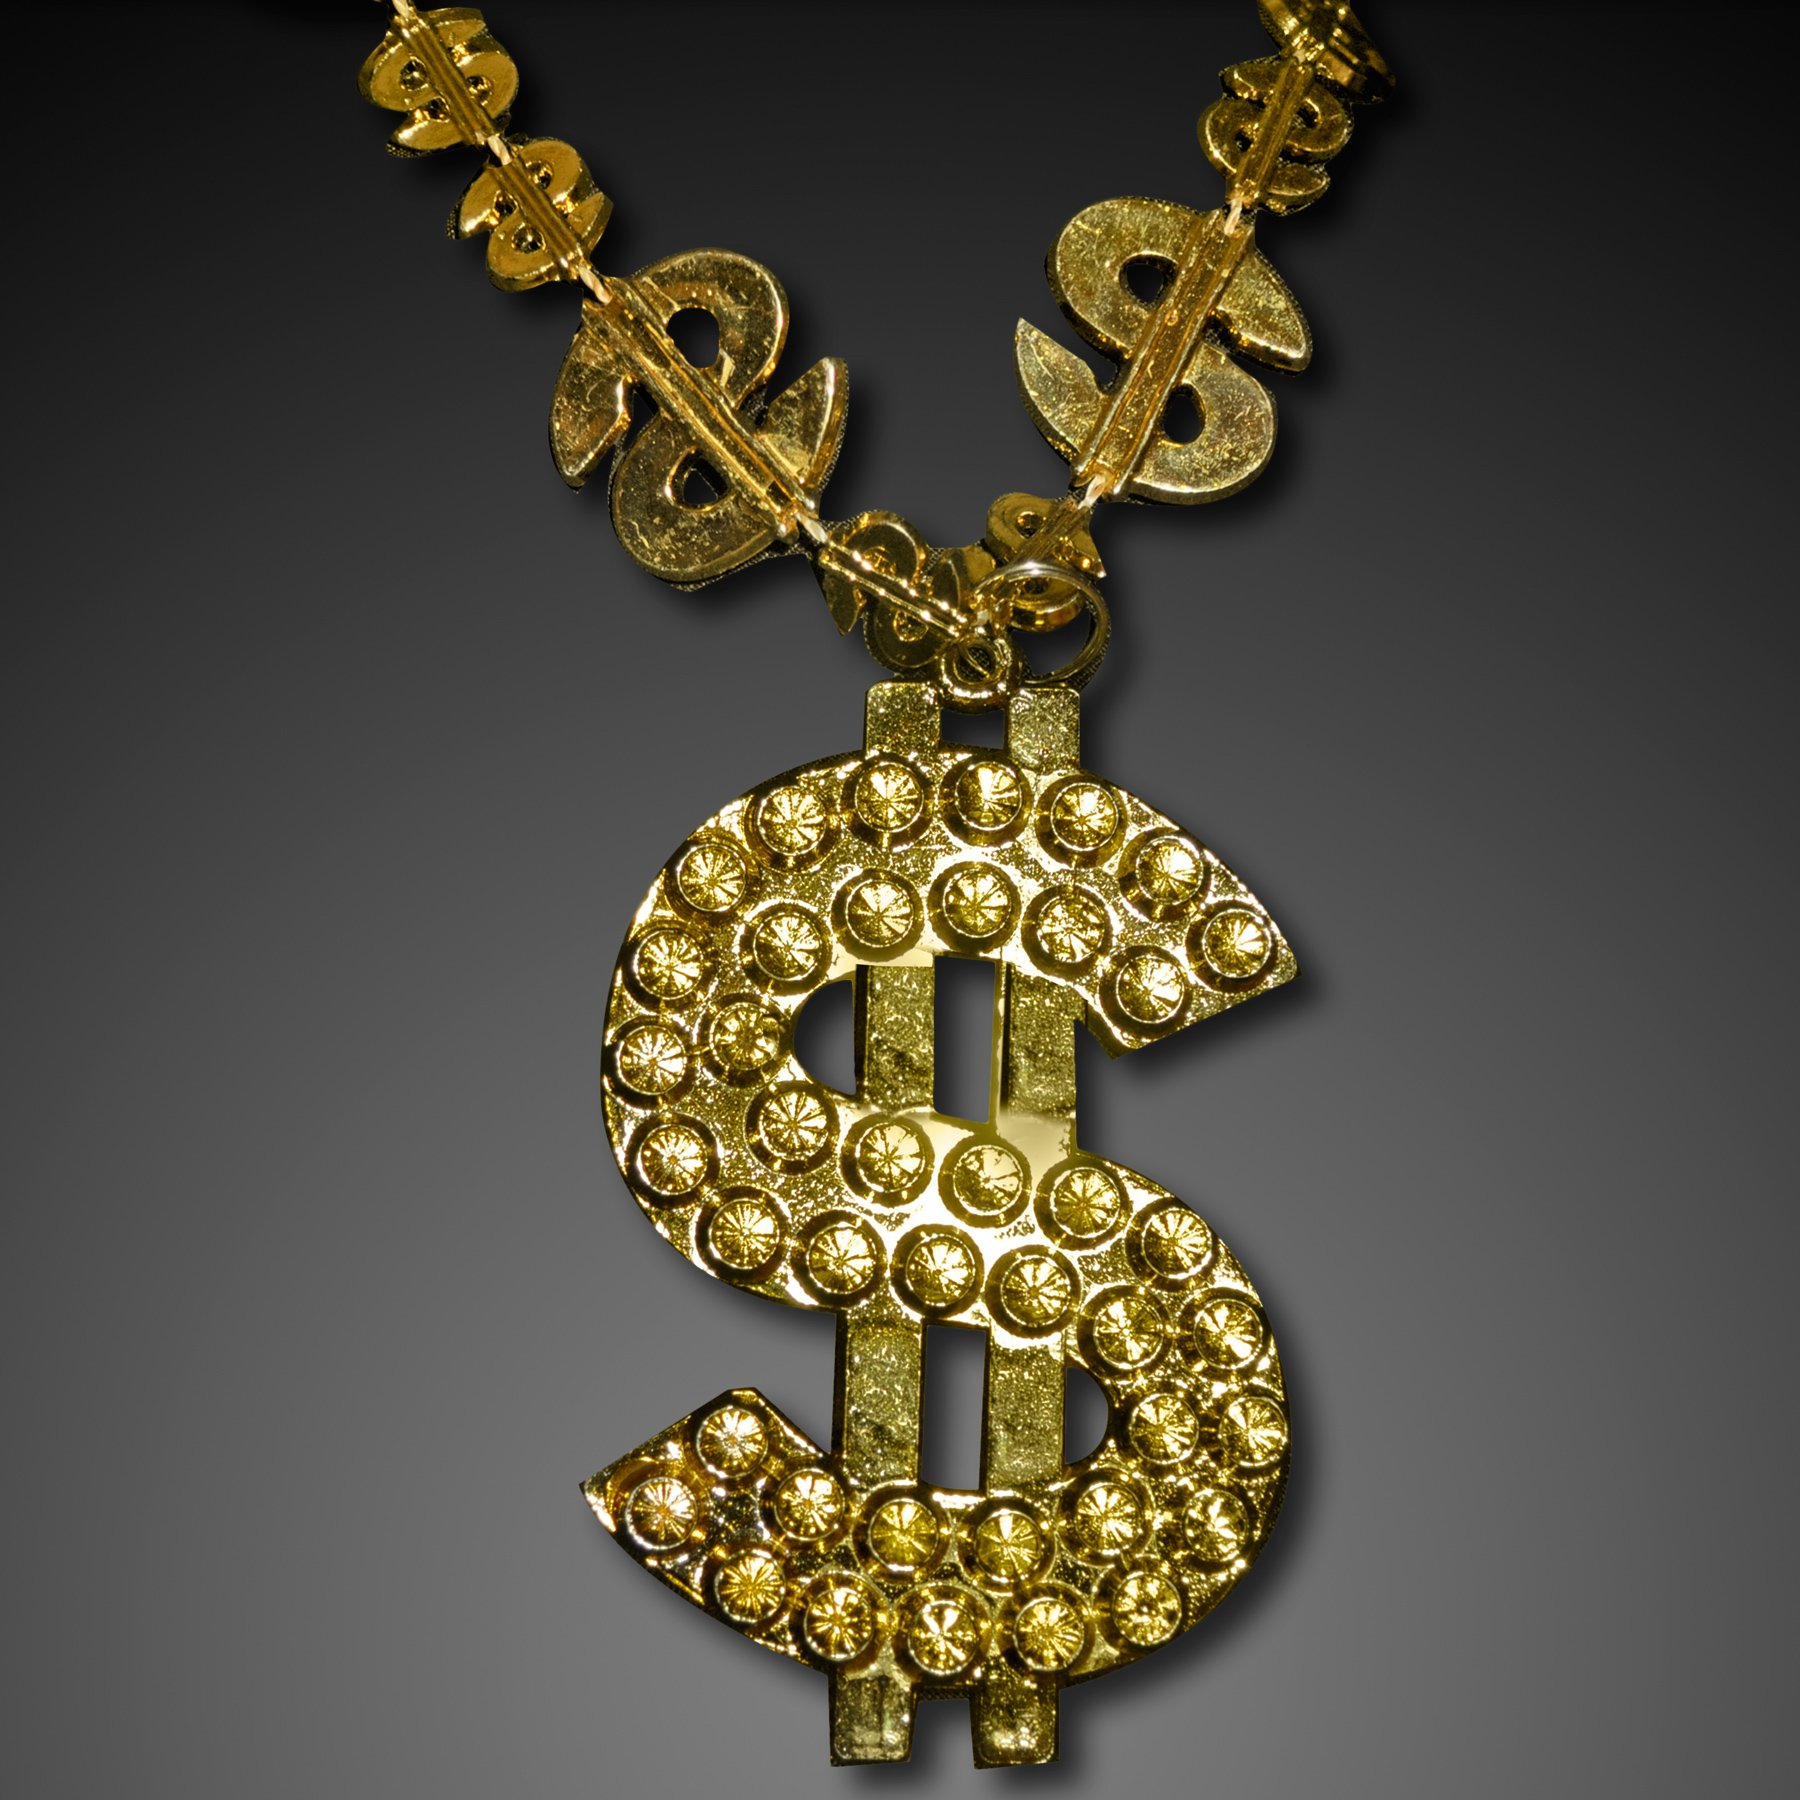 FlashingBlinkyLights Gold Big Bling Dollar Sign Novelty Necklace (Set of 48)